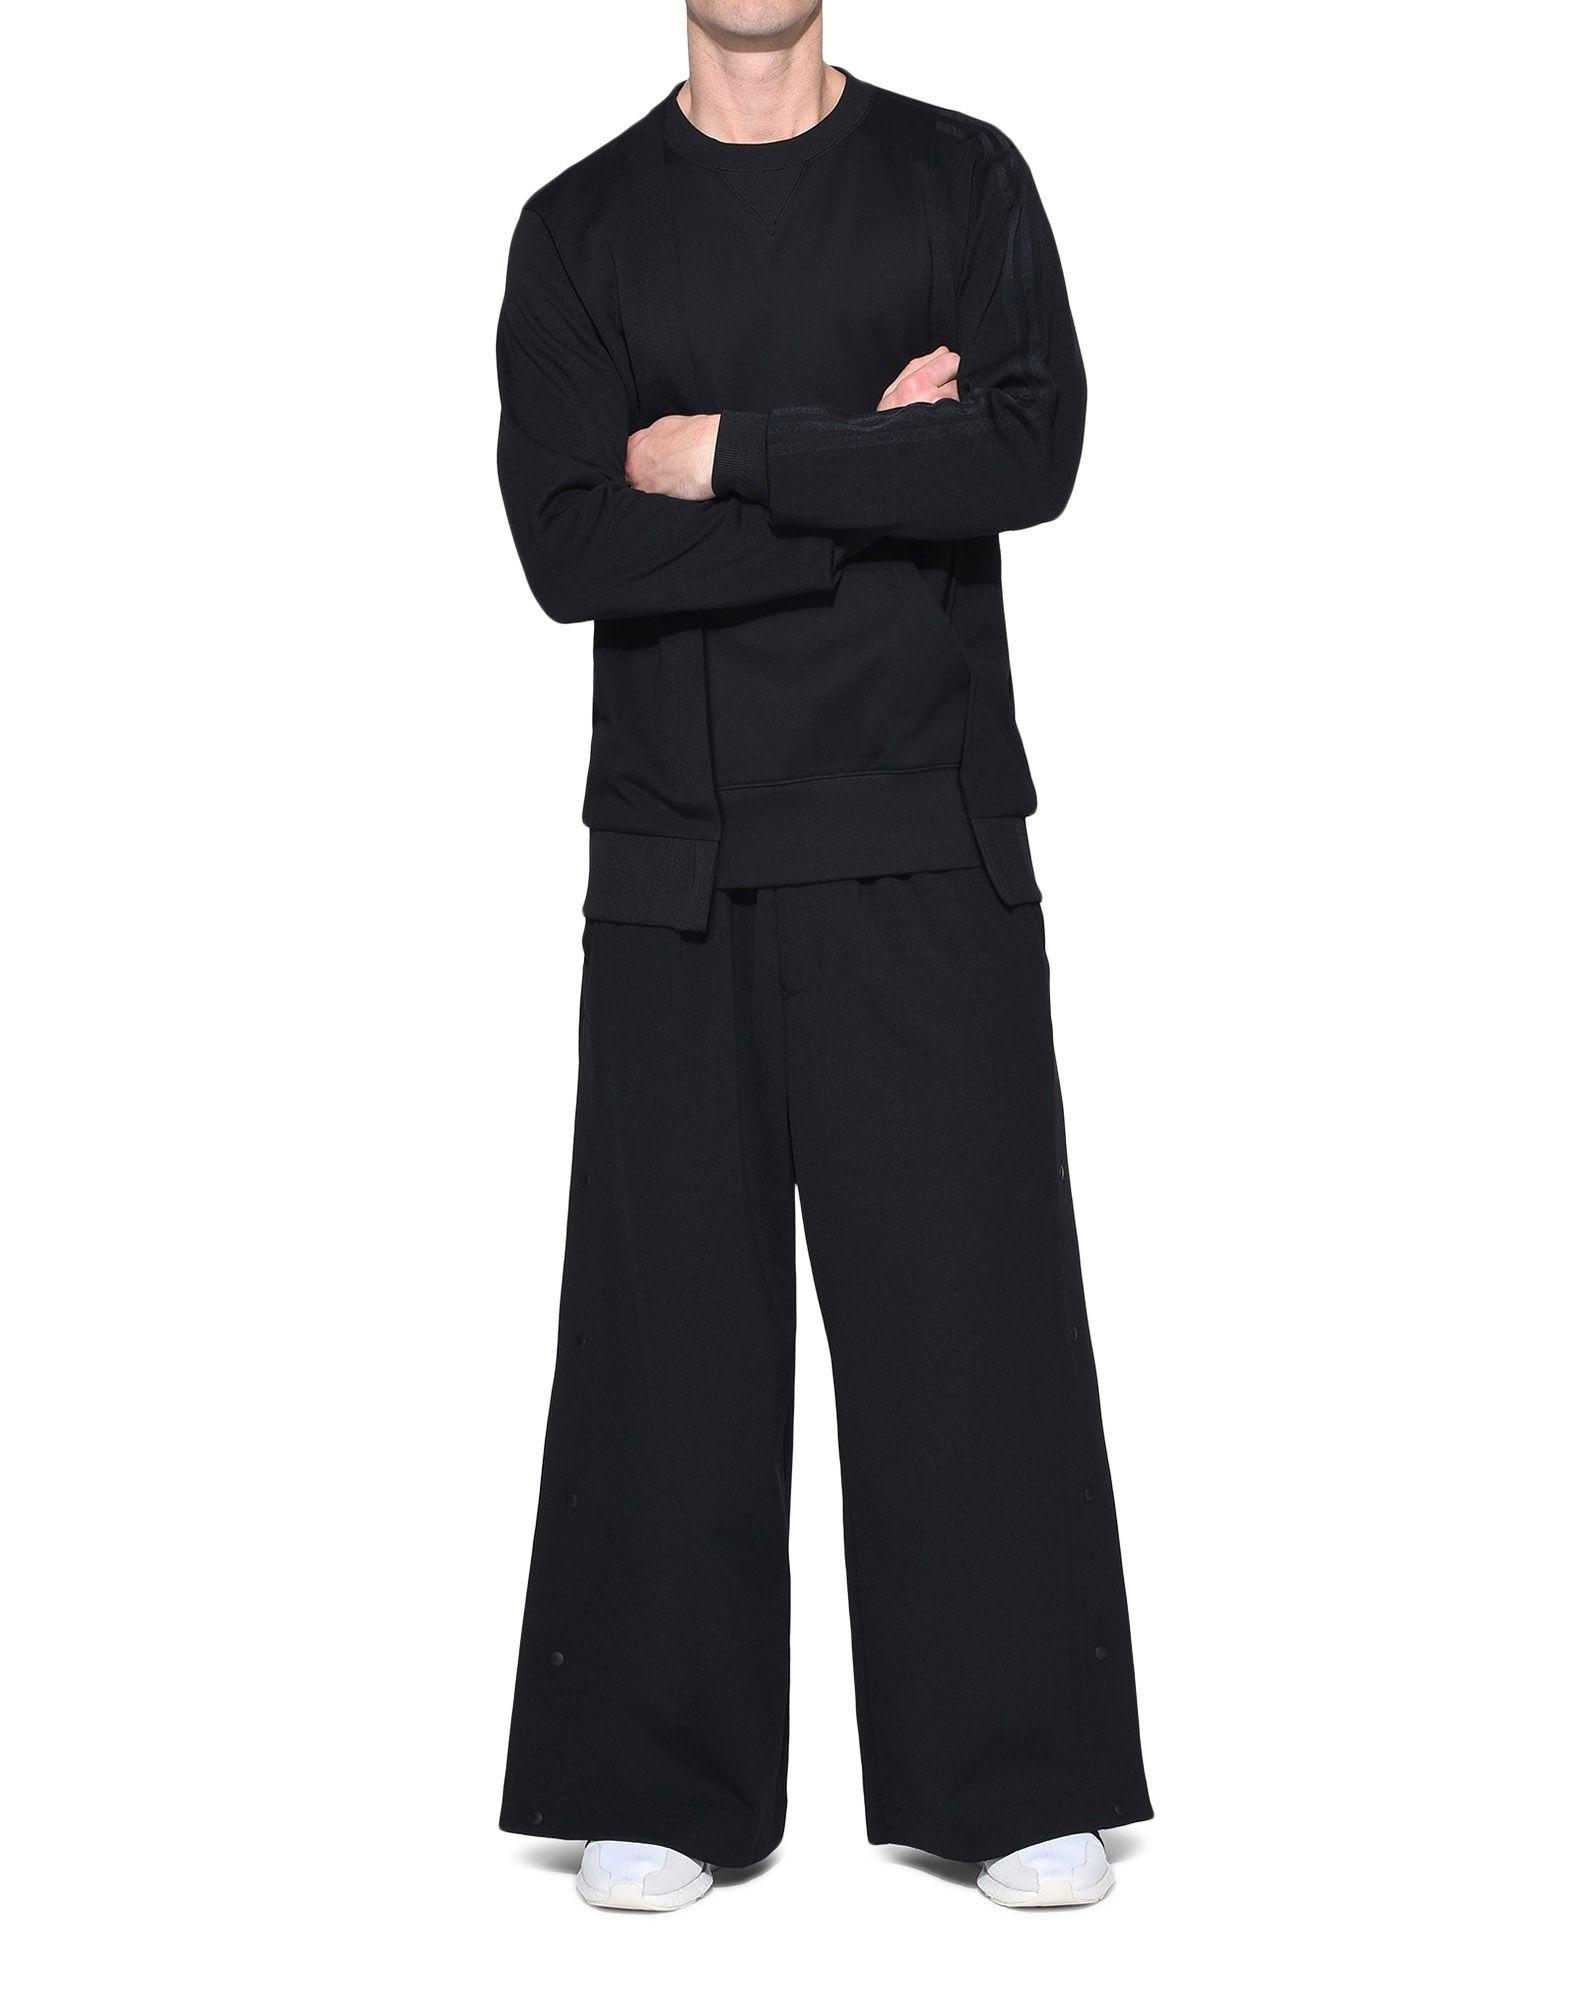 Y-3 Y-3 3-Stripes Matte Snap Track Pants Track pant Man a